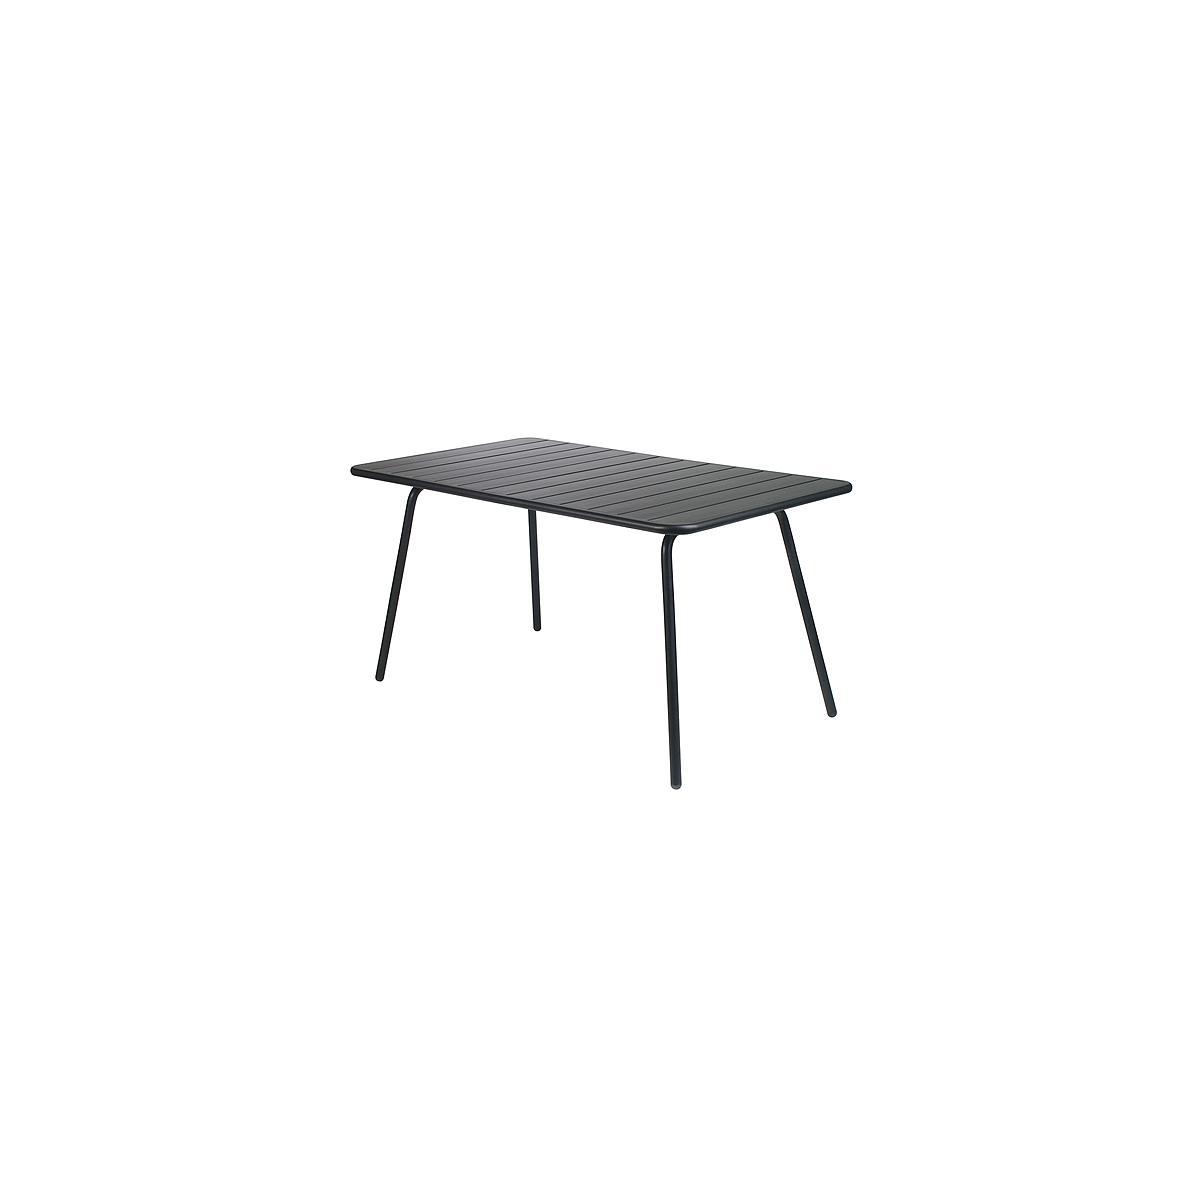 LUXEMBOURG by Fermob Table 143x80 cm noir réglisse